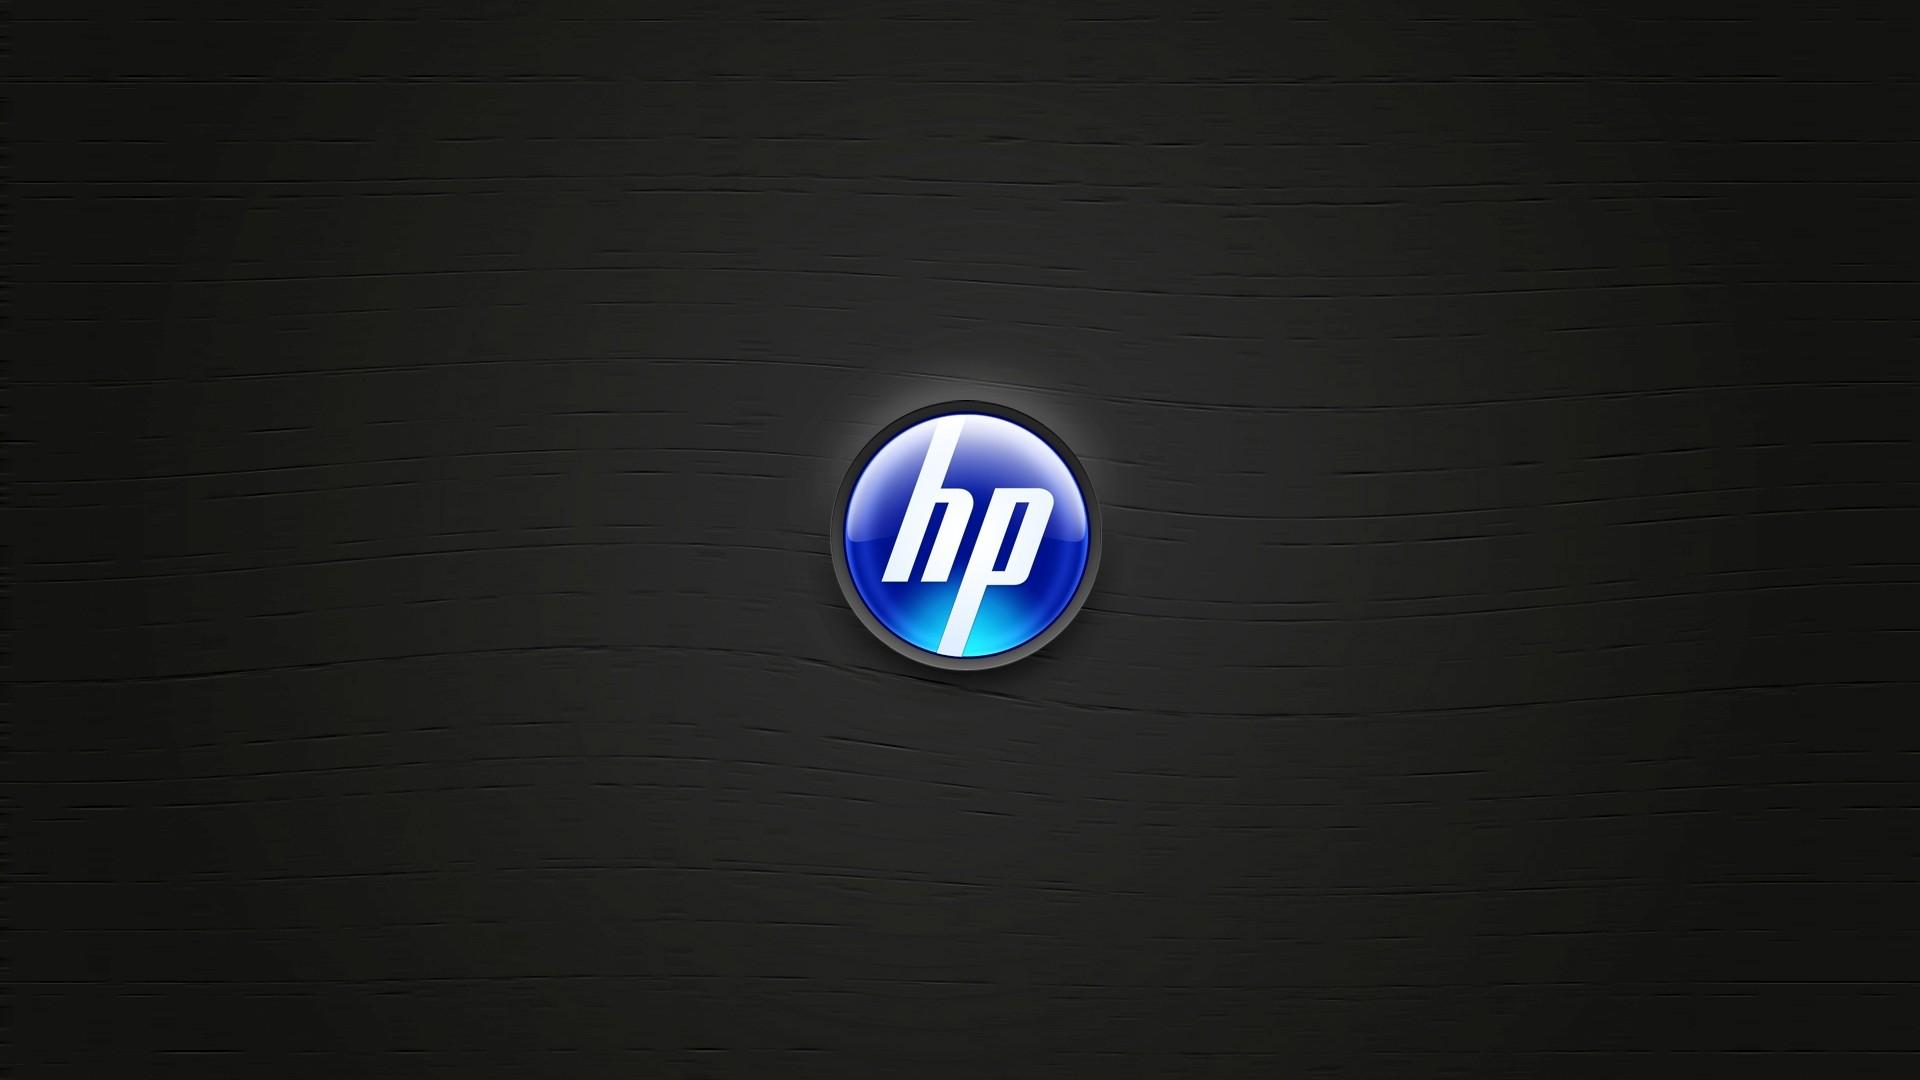 hp hd wallpaper widescreen 1920x1080 68 images